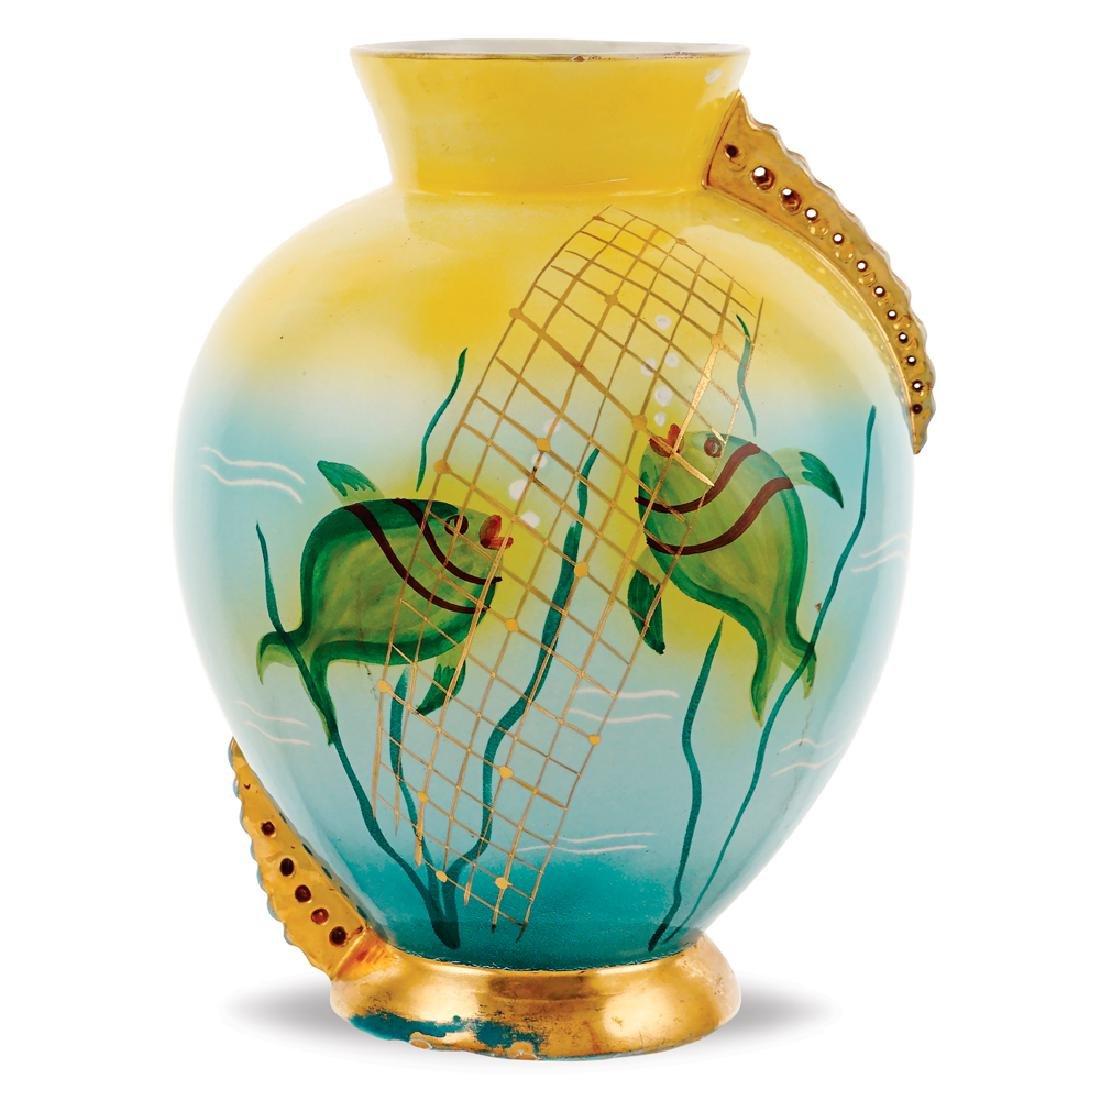 A ceramic vase Gualdo Tadino 20th century 29x11.5 cm.